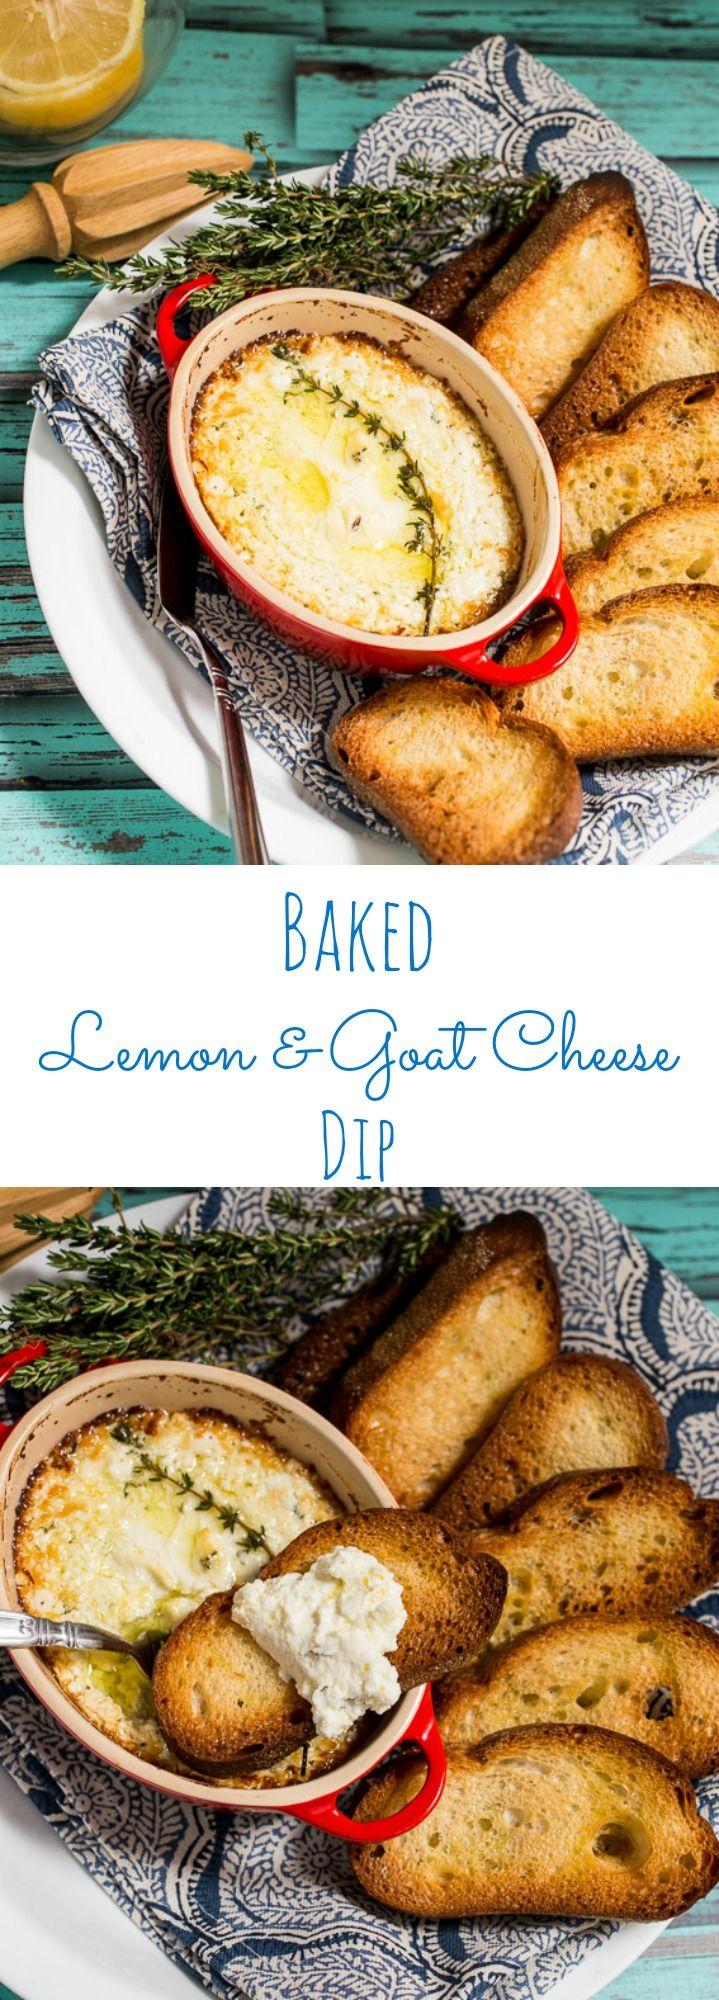 Baked Lemon and Goat Cheese Dip #SundaySupper